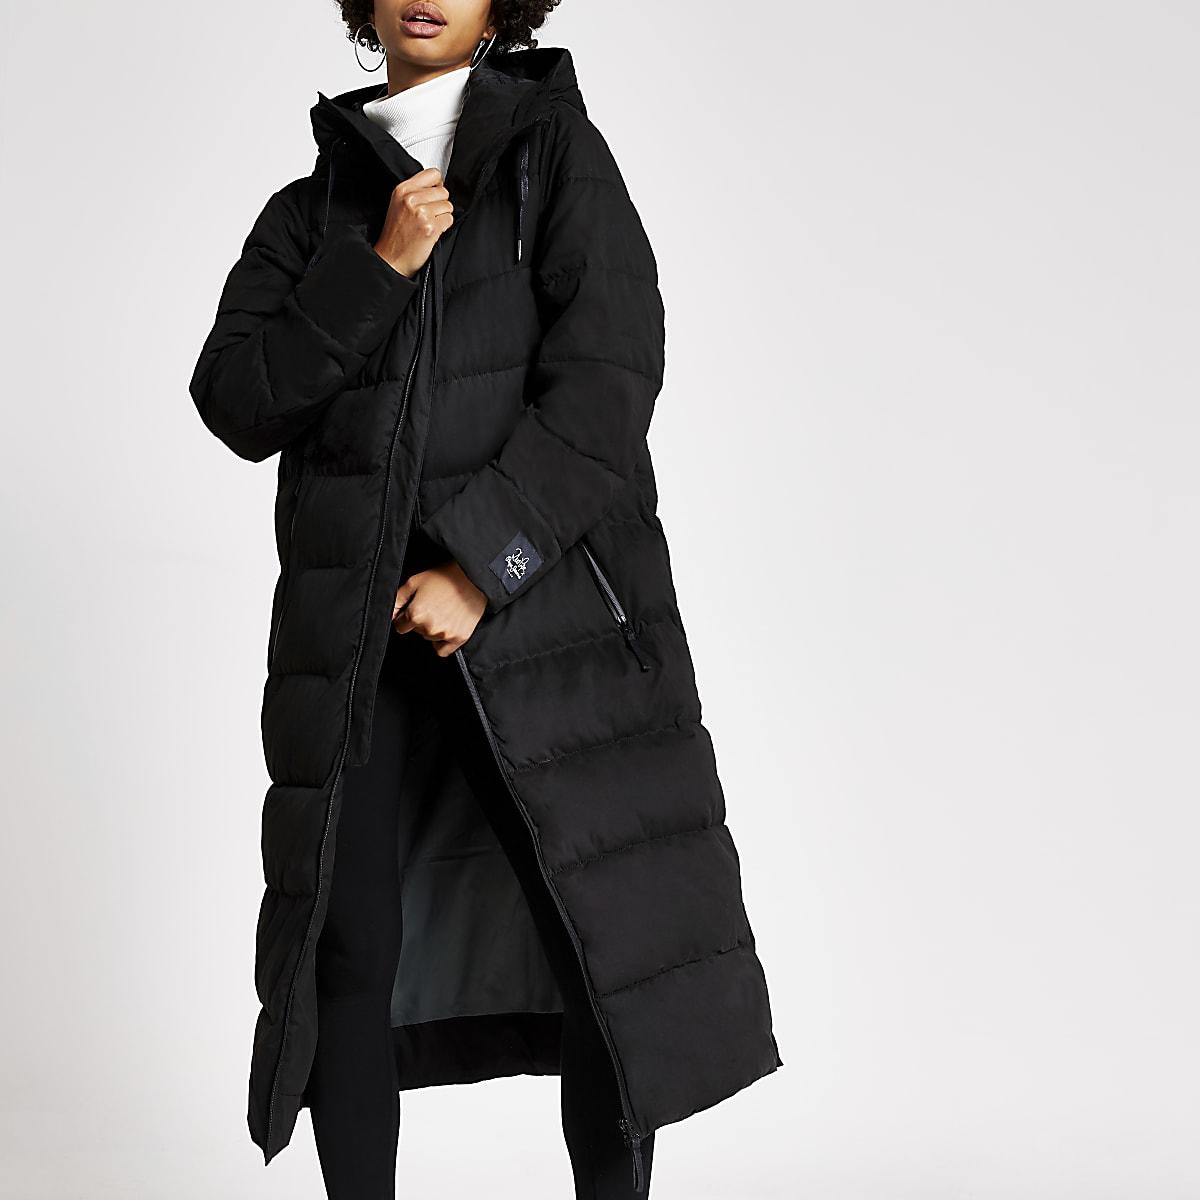 Dua Lipa X Pepe Jeans black puffer coat